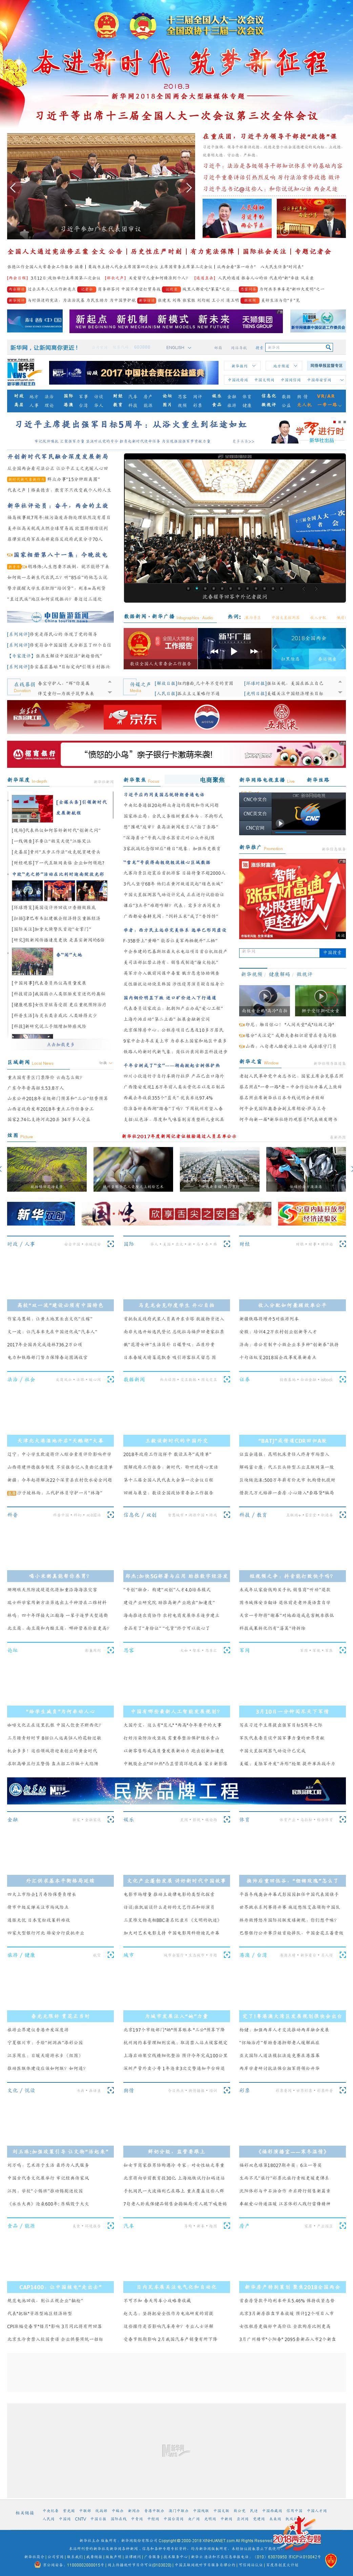 Xinhua at Sunday March 11, 2018, 5:05 p.m. UTC